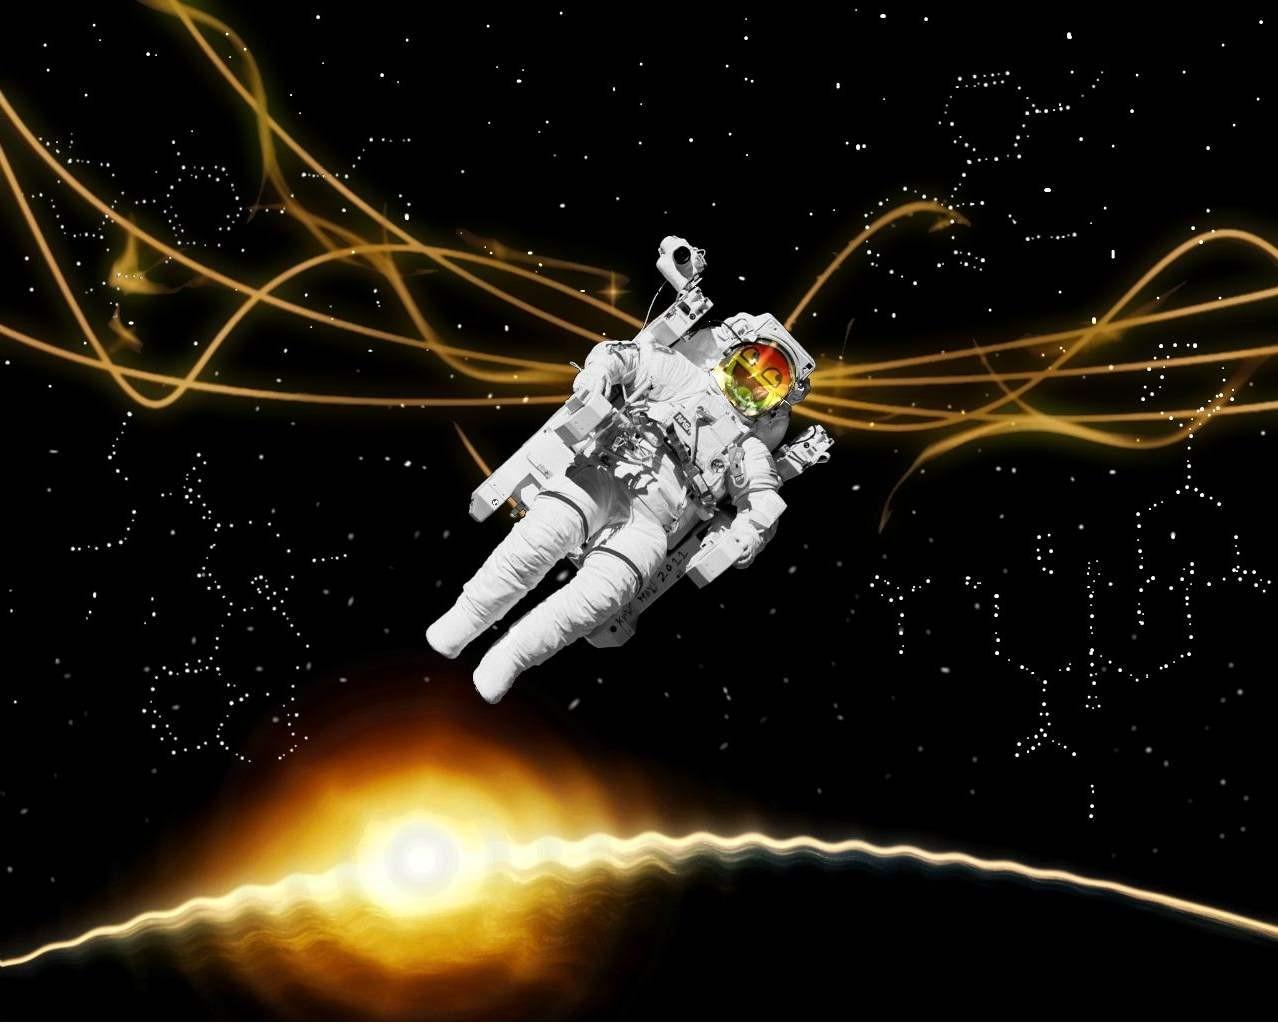 Lsd wallpapers wallpapersafari for Drugs in space